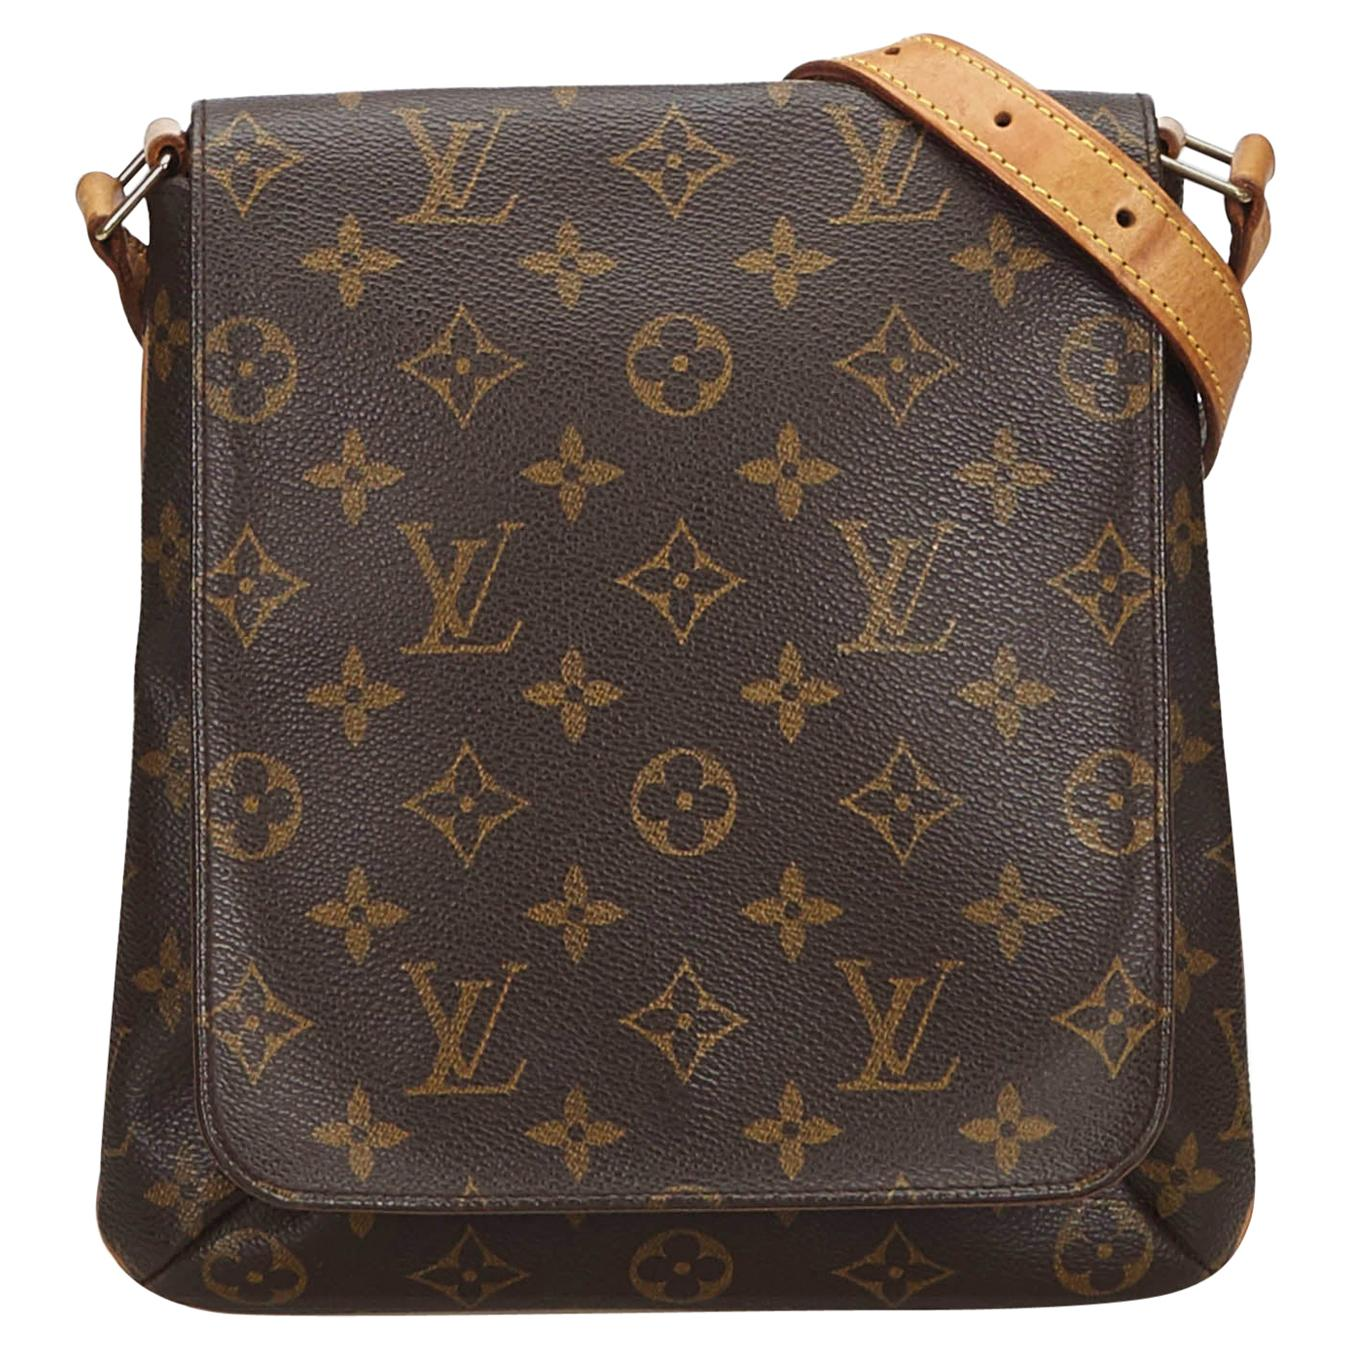 743fe47c05621 Vintage Louis Vuitton Shoulder Bags - 813 For Sale at 1stdibs